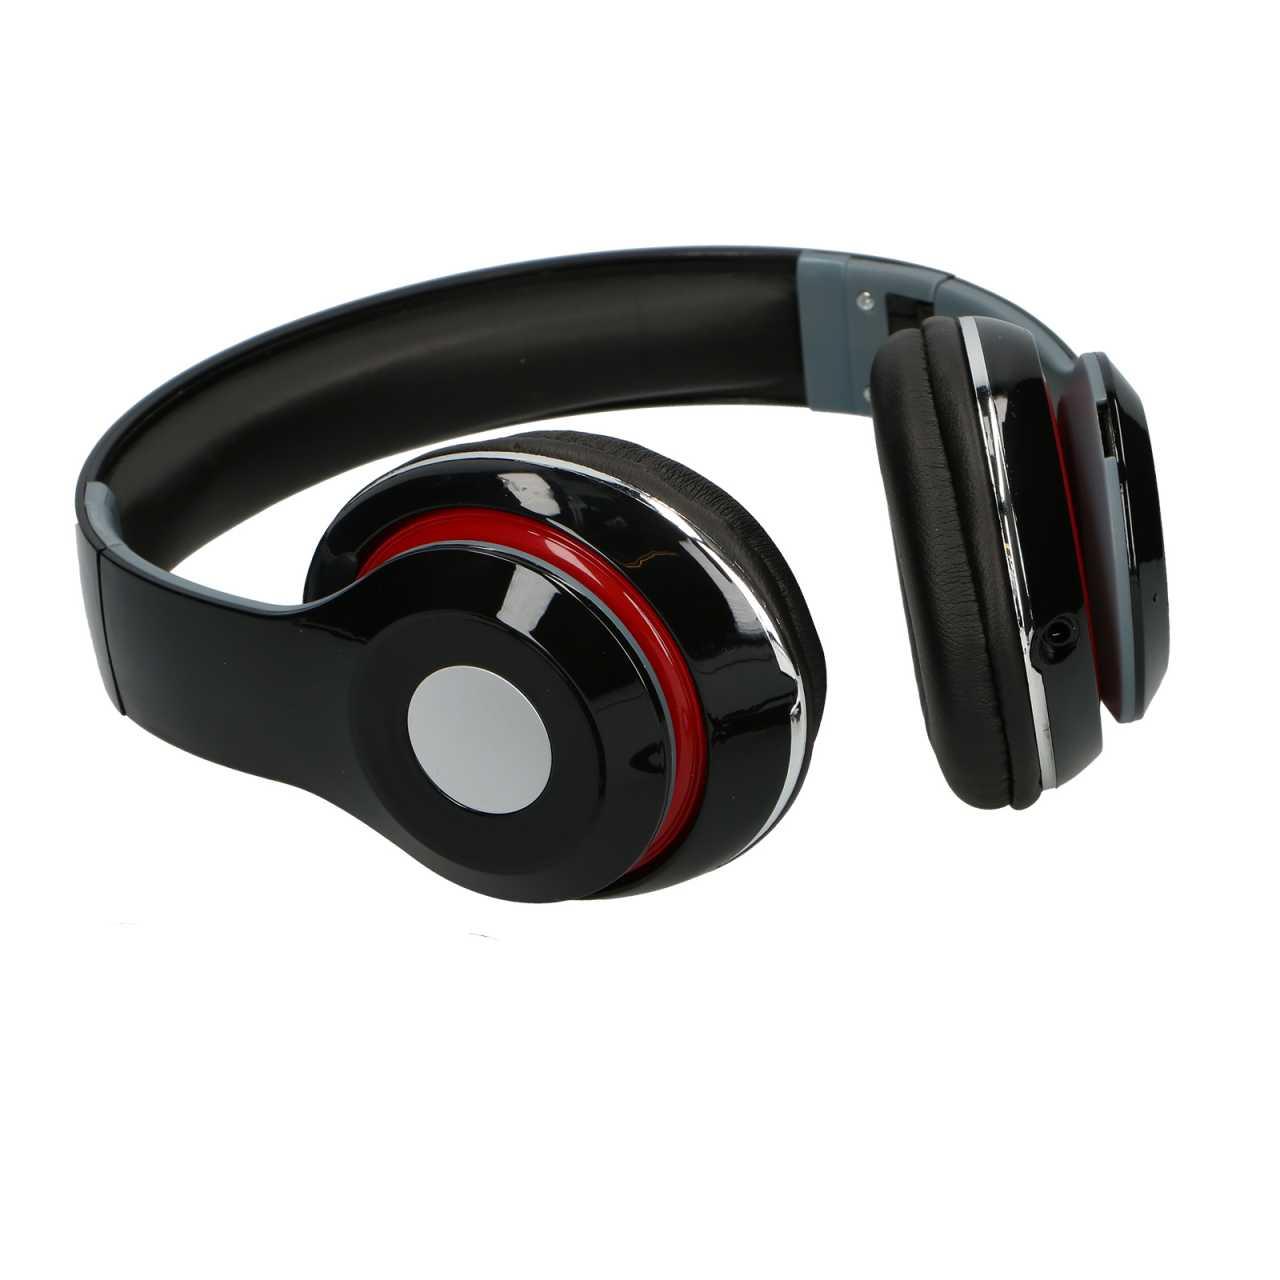 Soundlogic kabellose HD-Kophörer / Headset mit Bluetooth, Micro-SD, Mikrophon und FM-Tuner